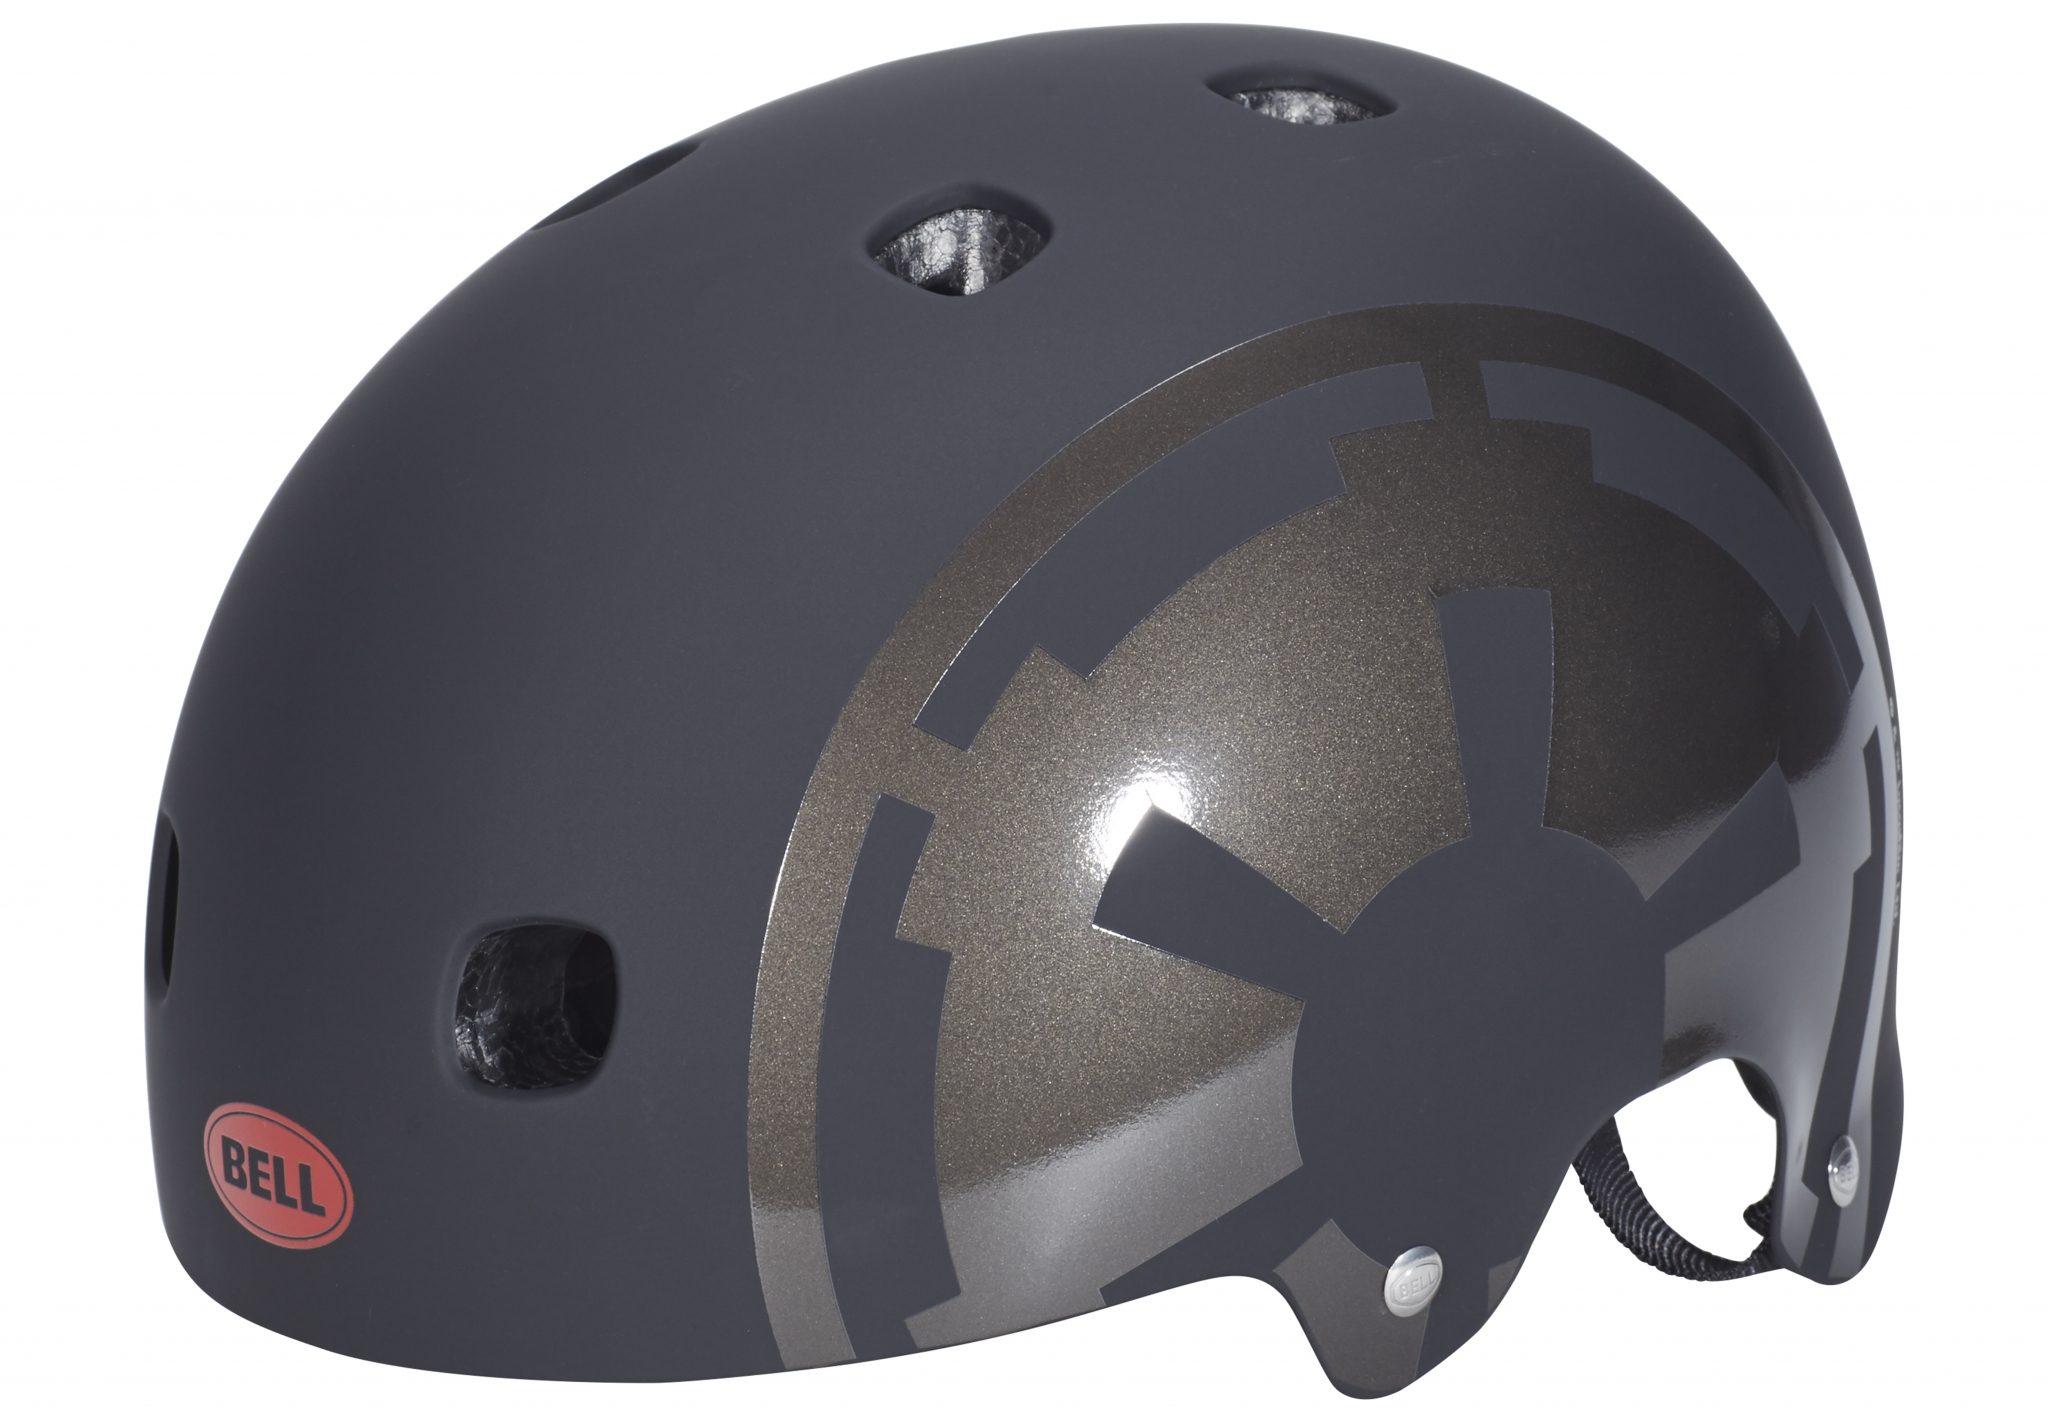 Bell Fahrradhelm »Segment Star Wars Helmet«